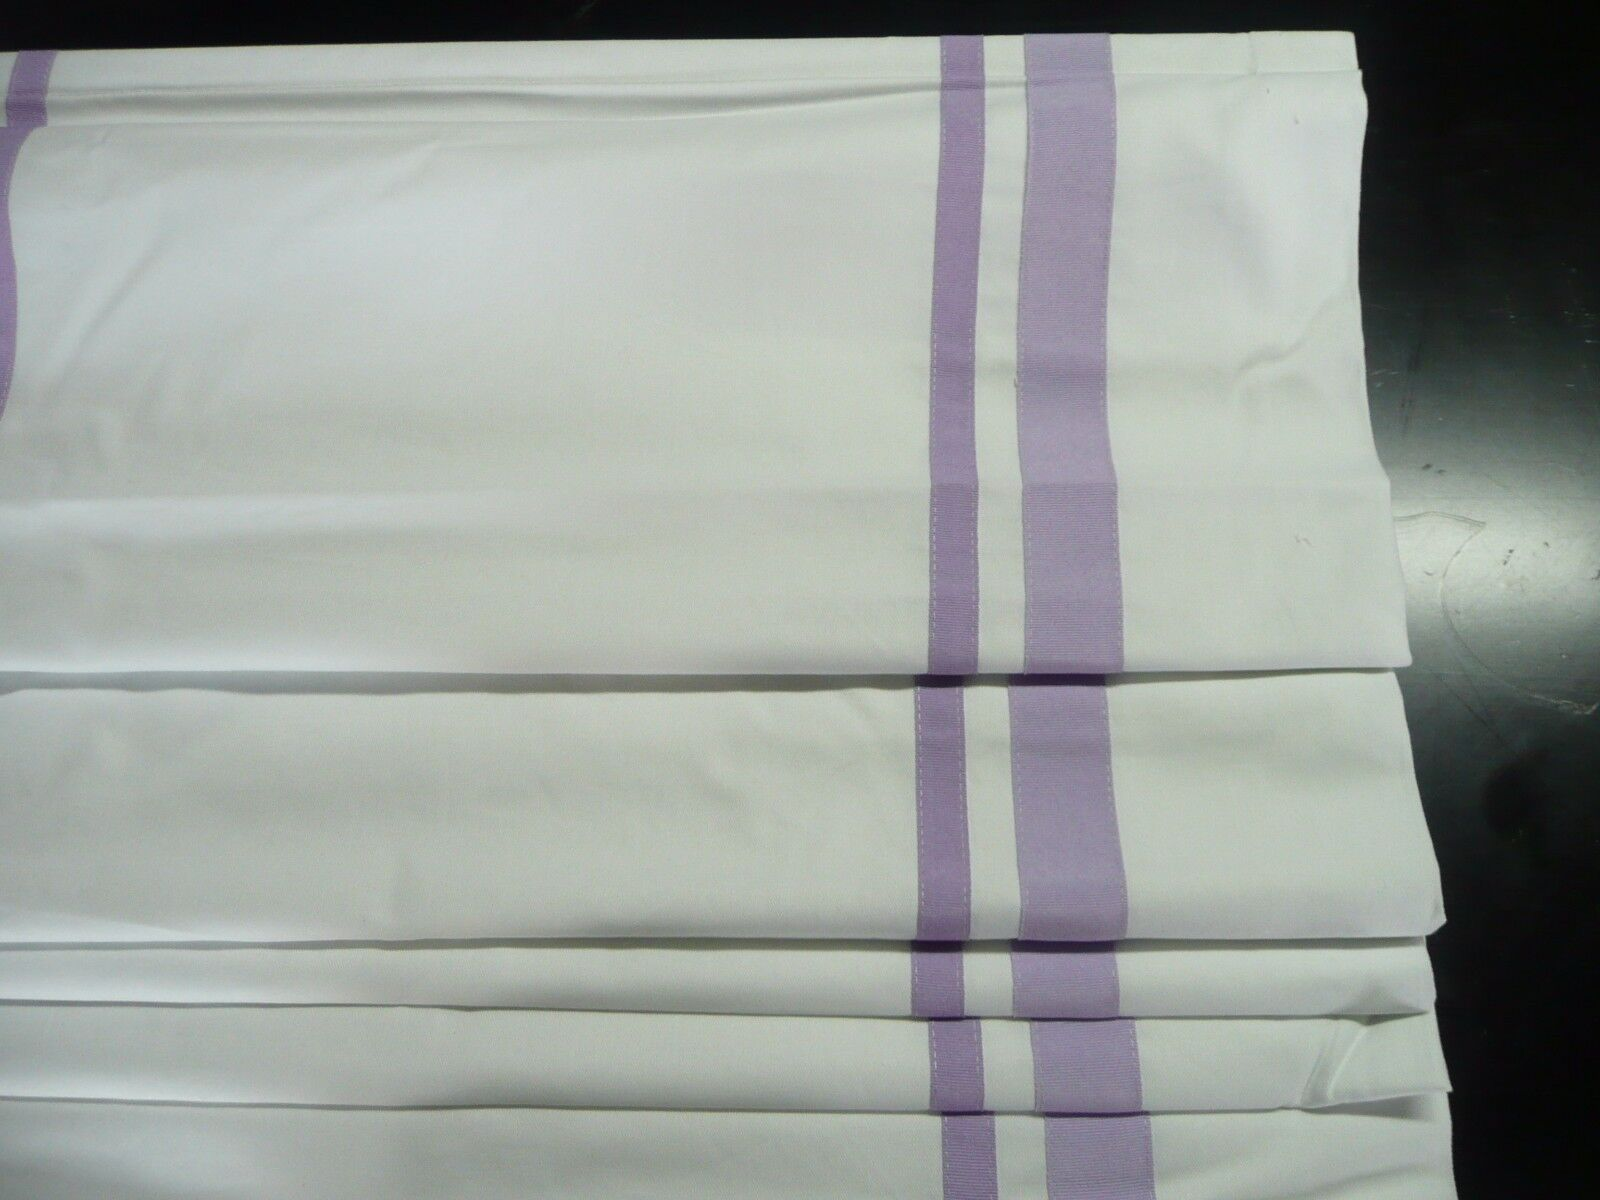 Pottery Barn Harper Ribbon Roman Shade Lavender 32x64 Cordless More